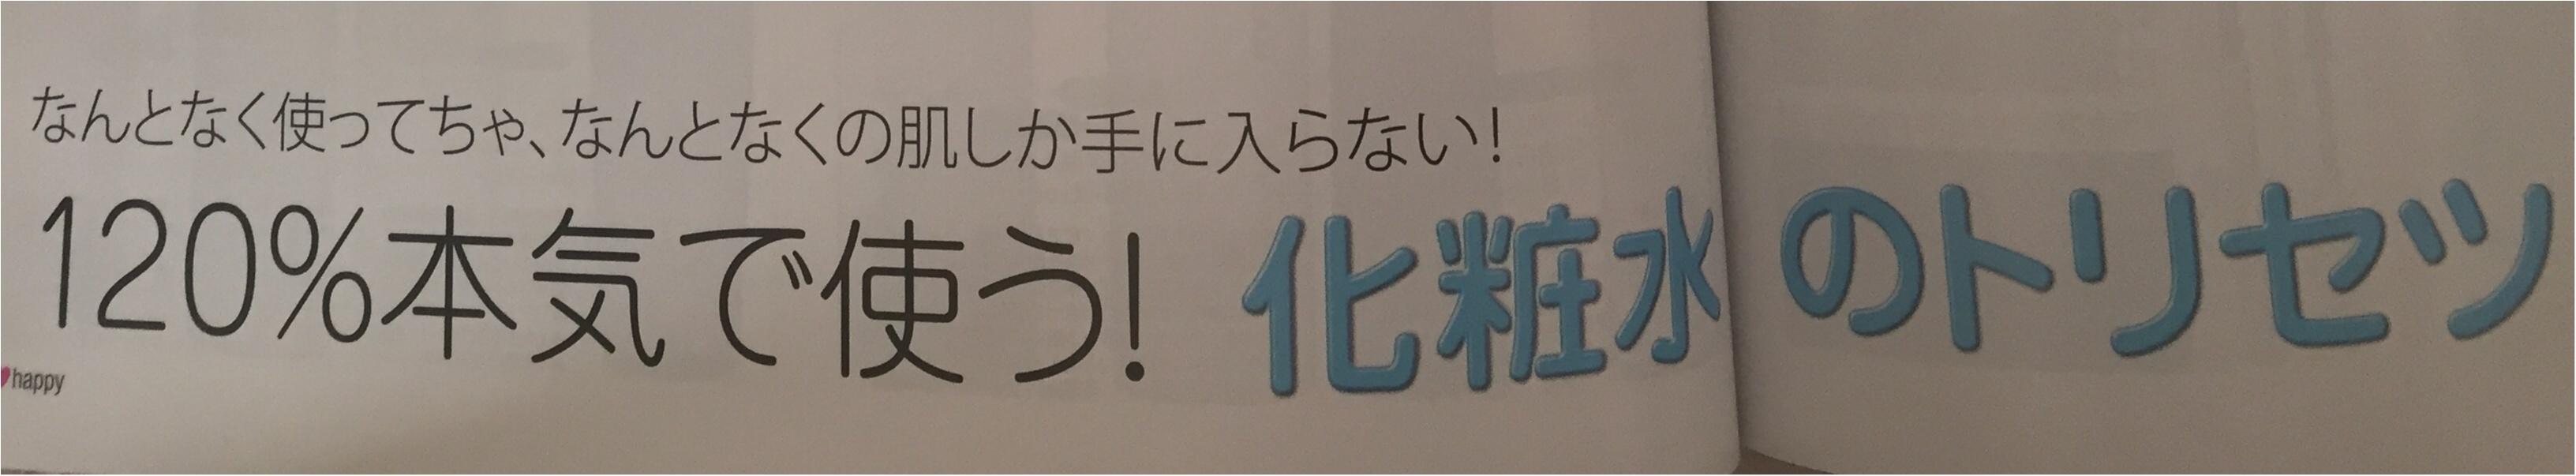 【MORE12月号☆発売中】特別付録はCOACHステーショナリー4点セット✨≪samenyan≫_12